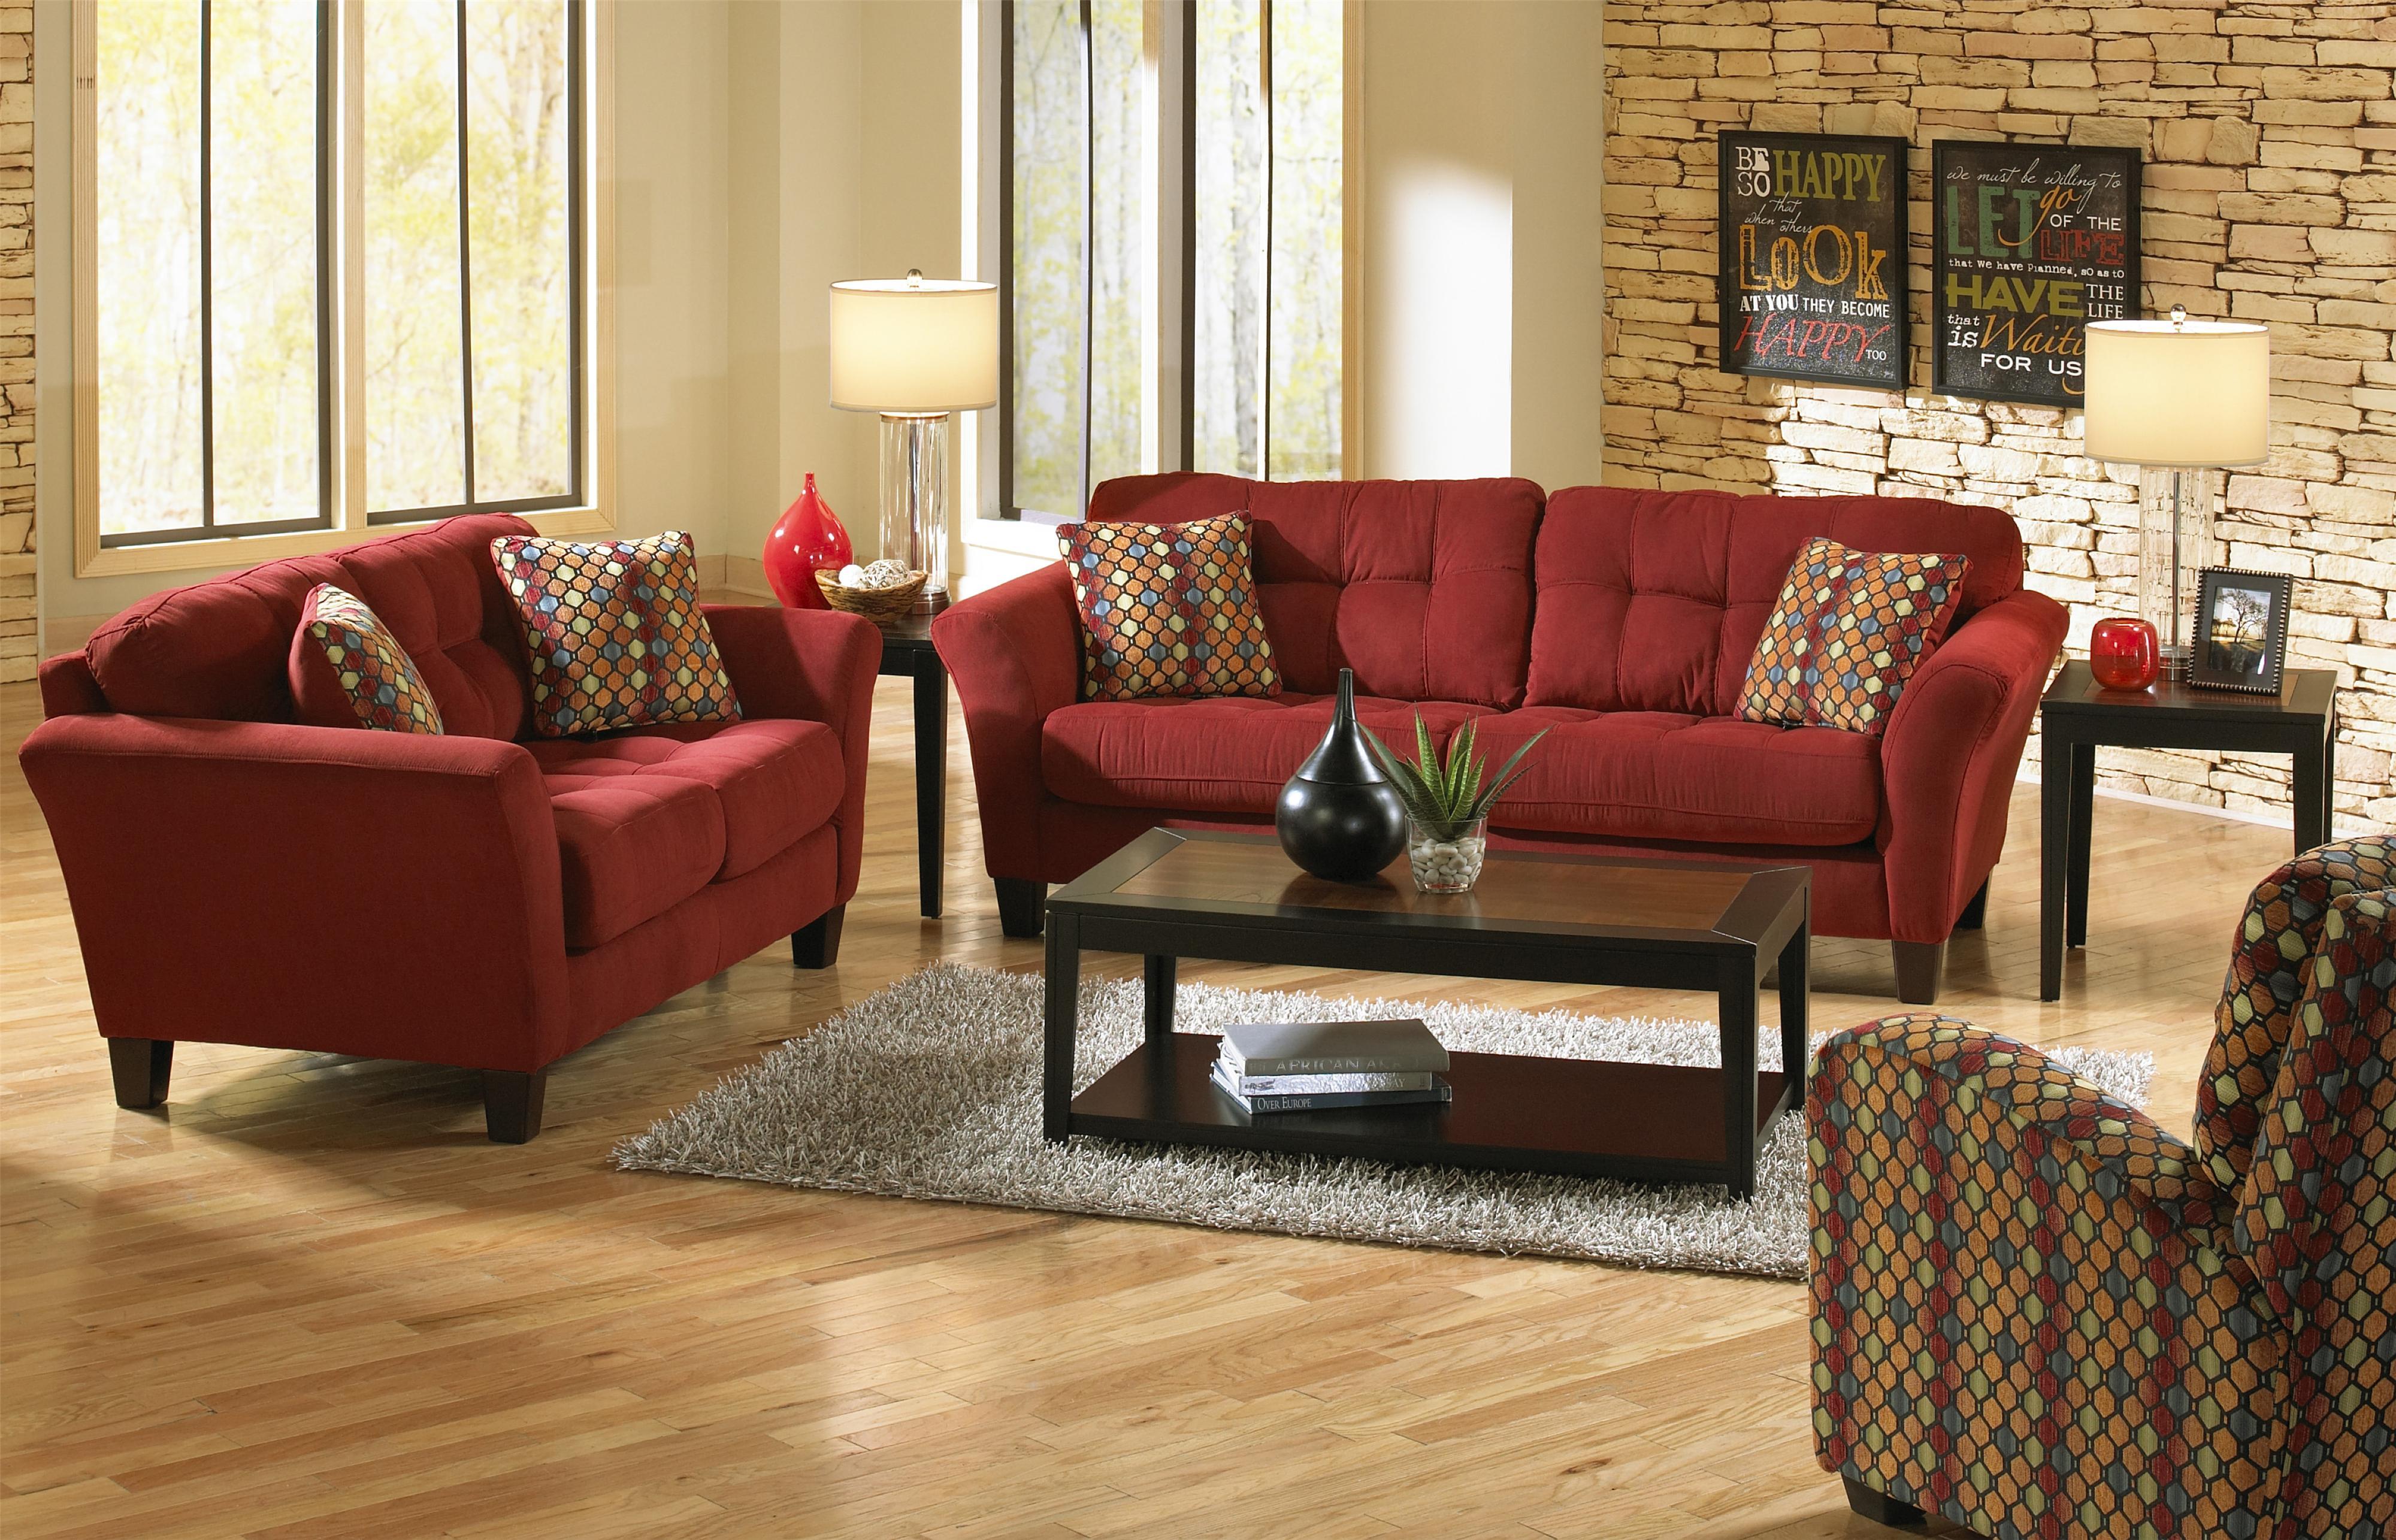 Jackson Furniture Halle Stationary Living Room Group - Item Number: 4381 Living Room Group 2